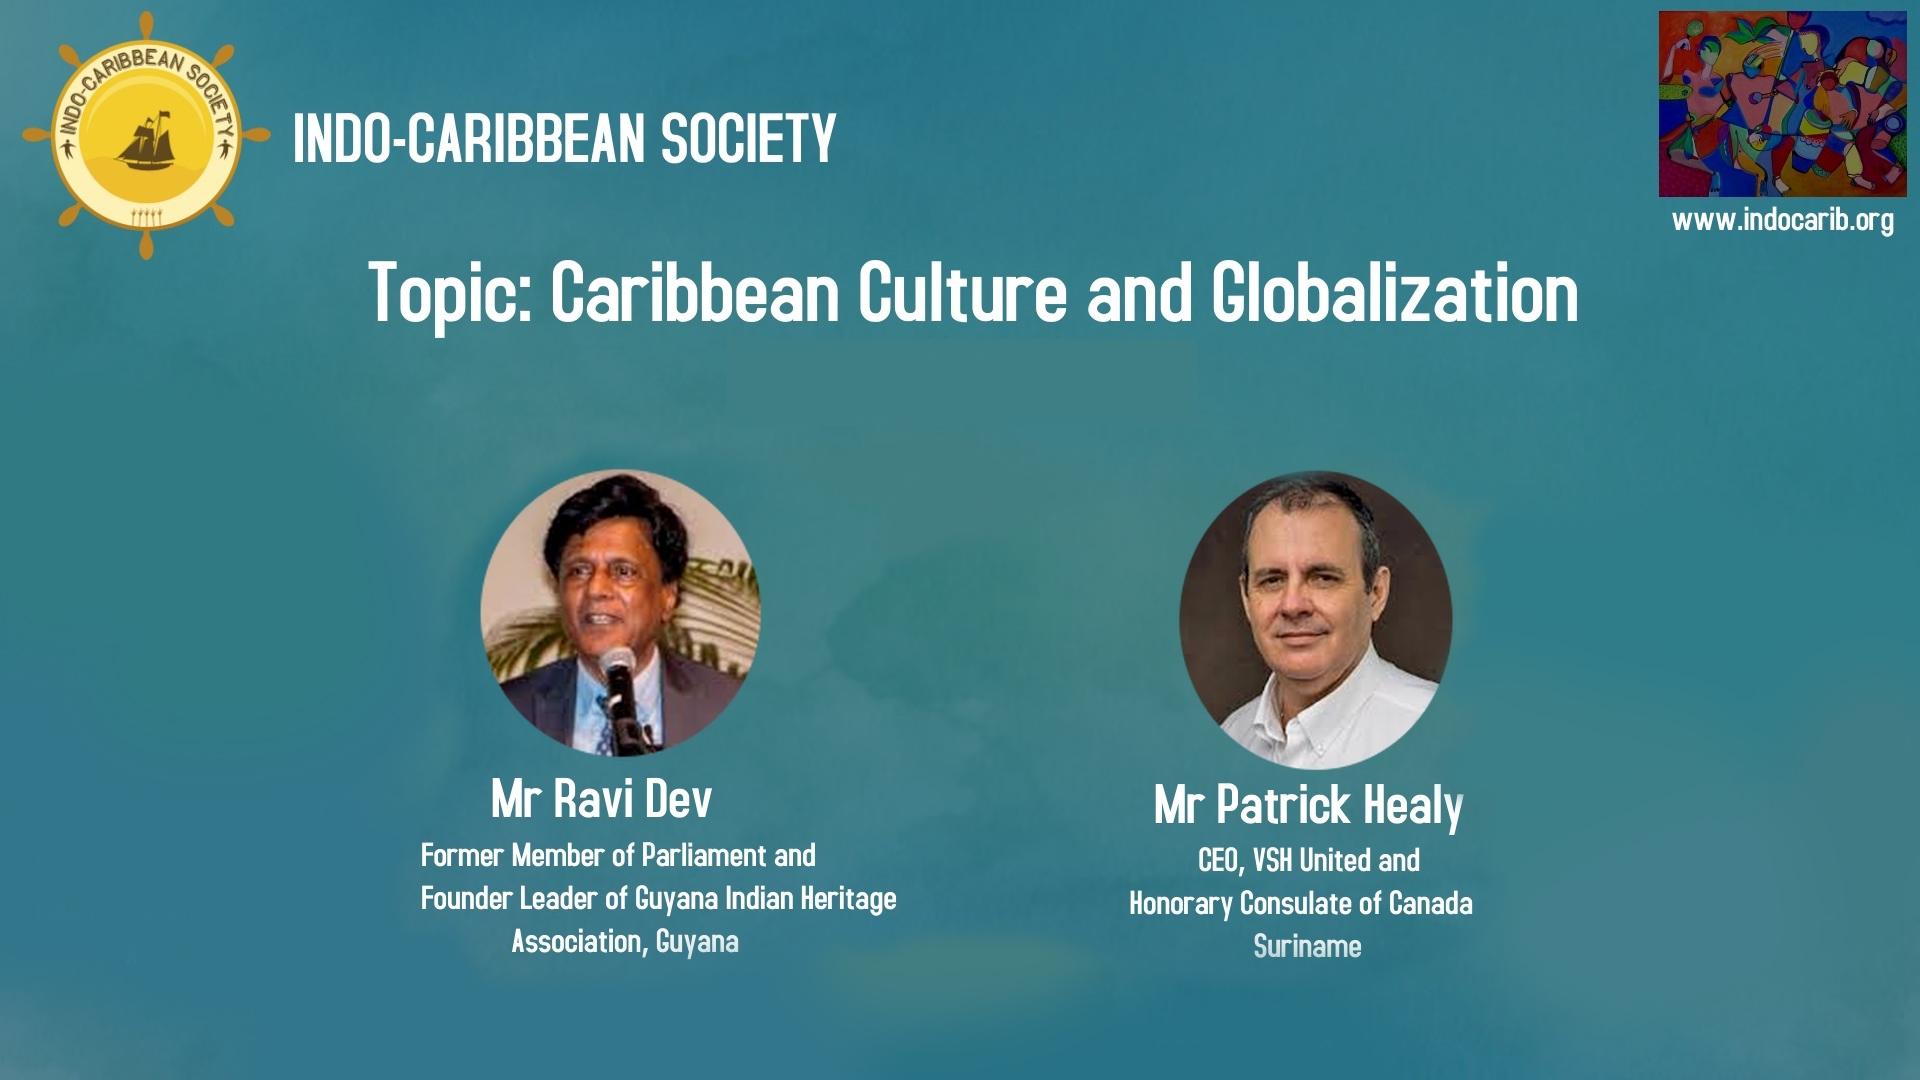 Caribbean Culture and Globalization